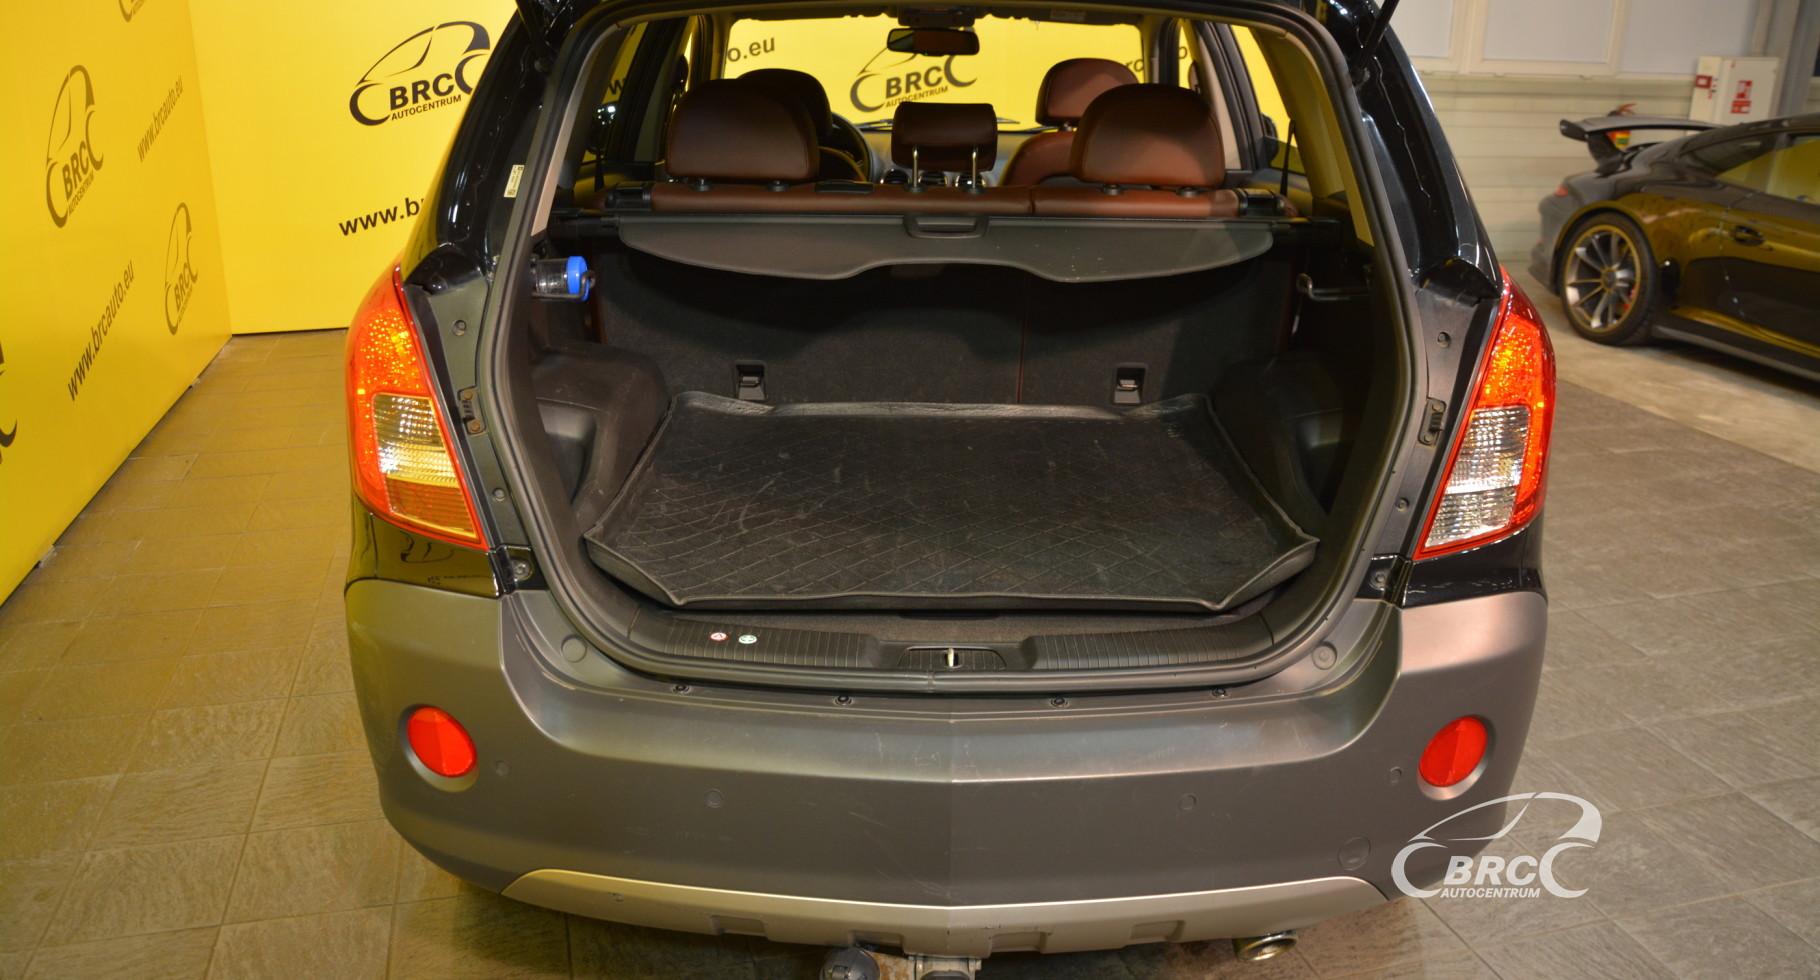 Opel Antara 2.2 CDTI 4x4 Automatas